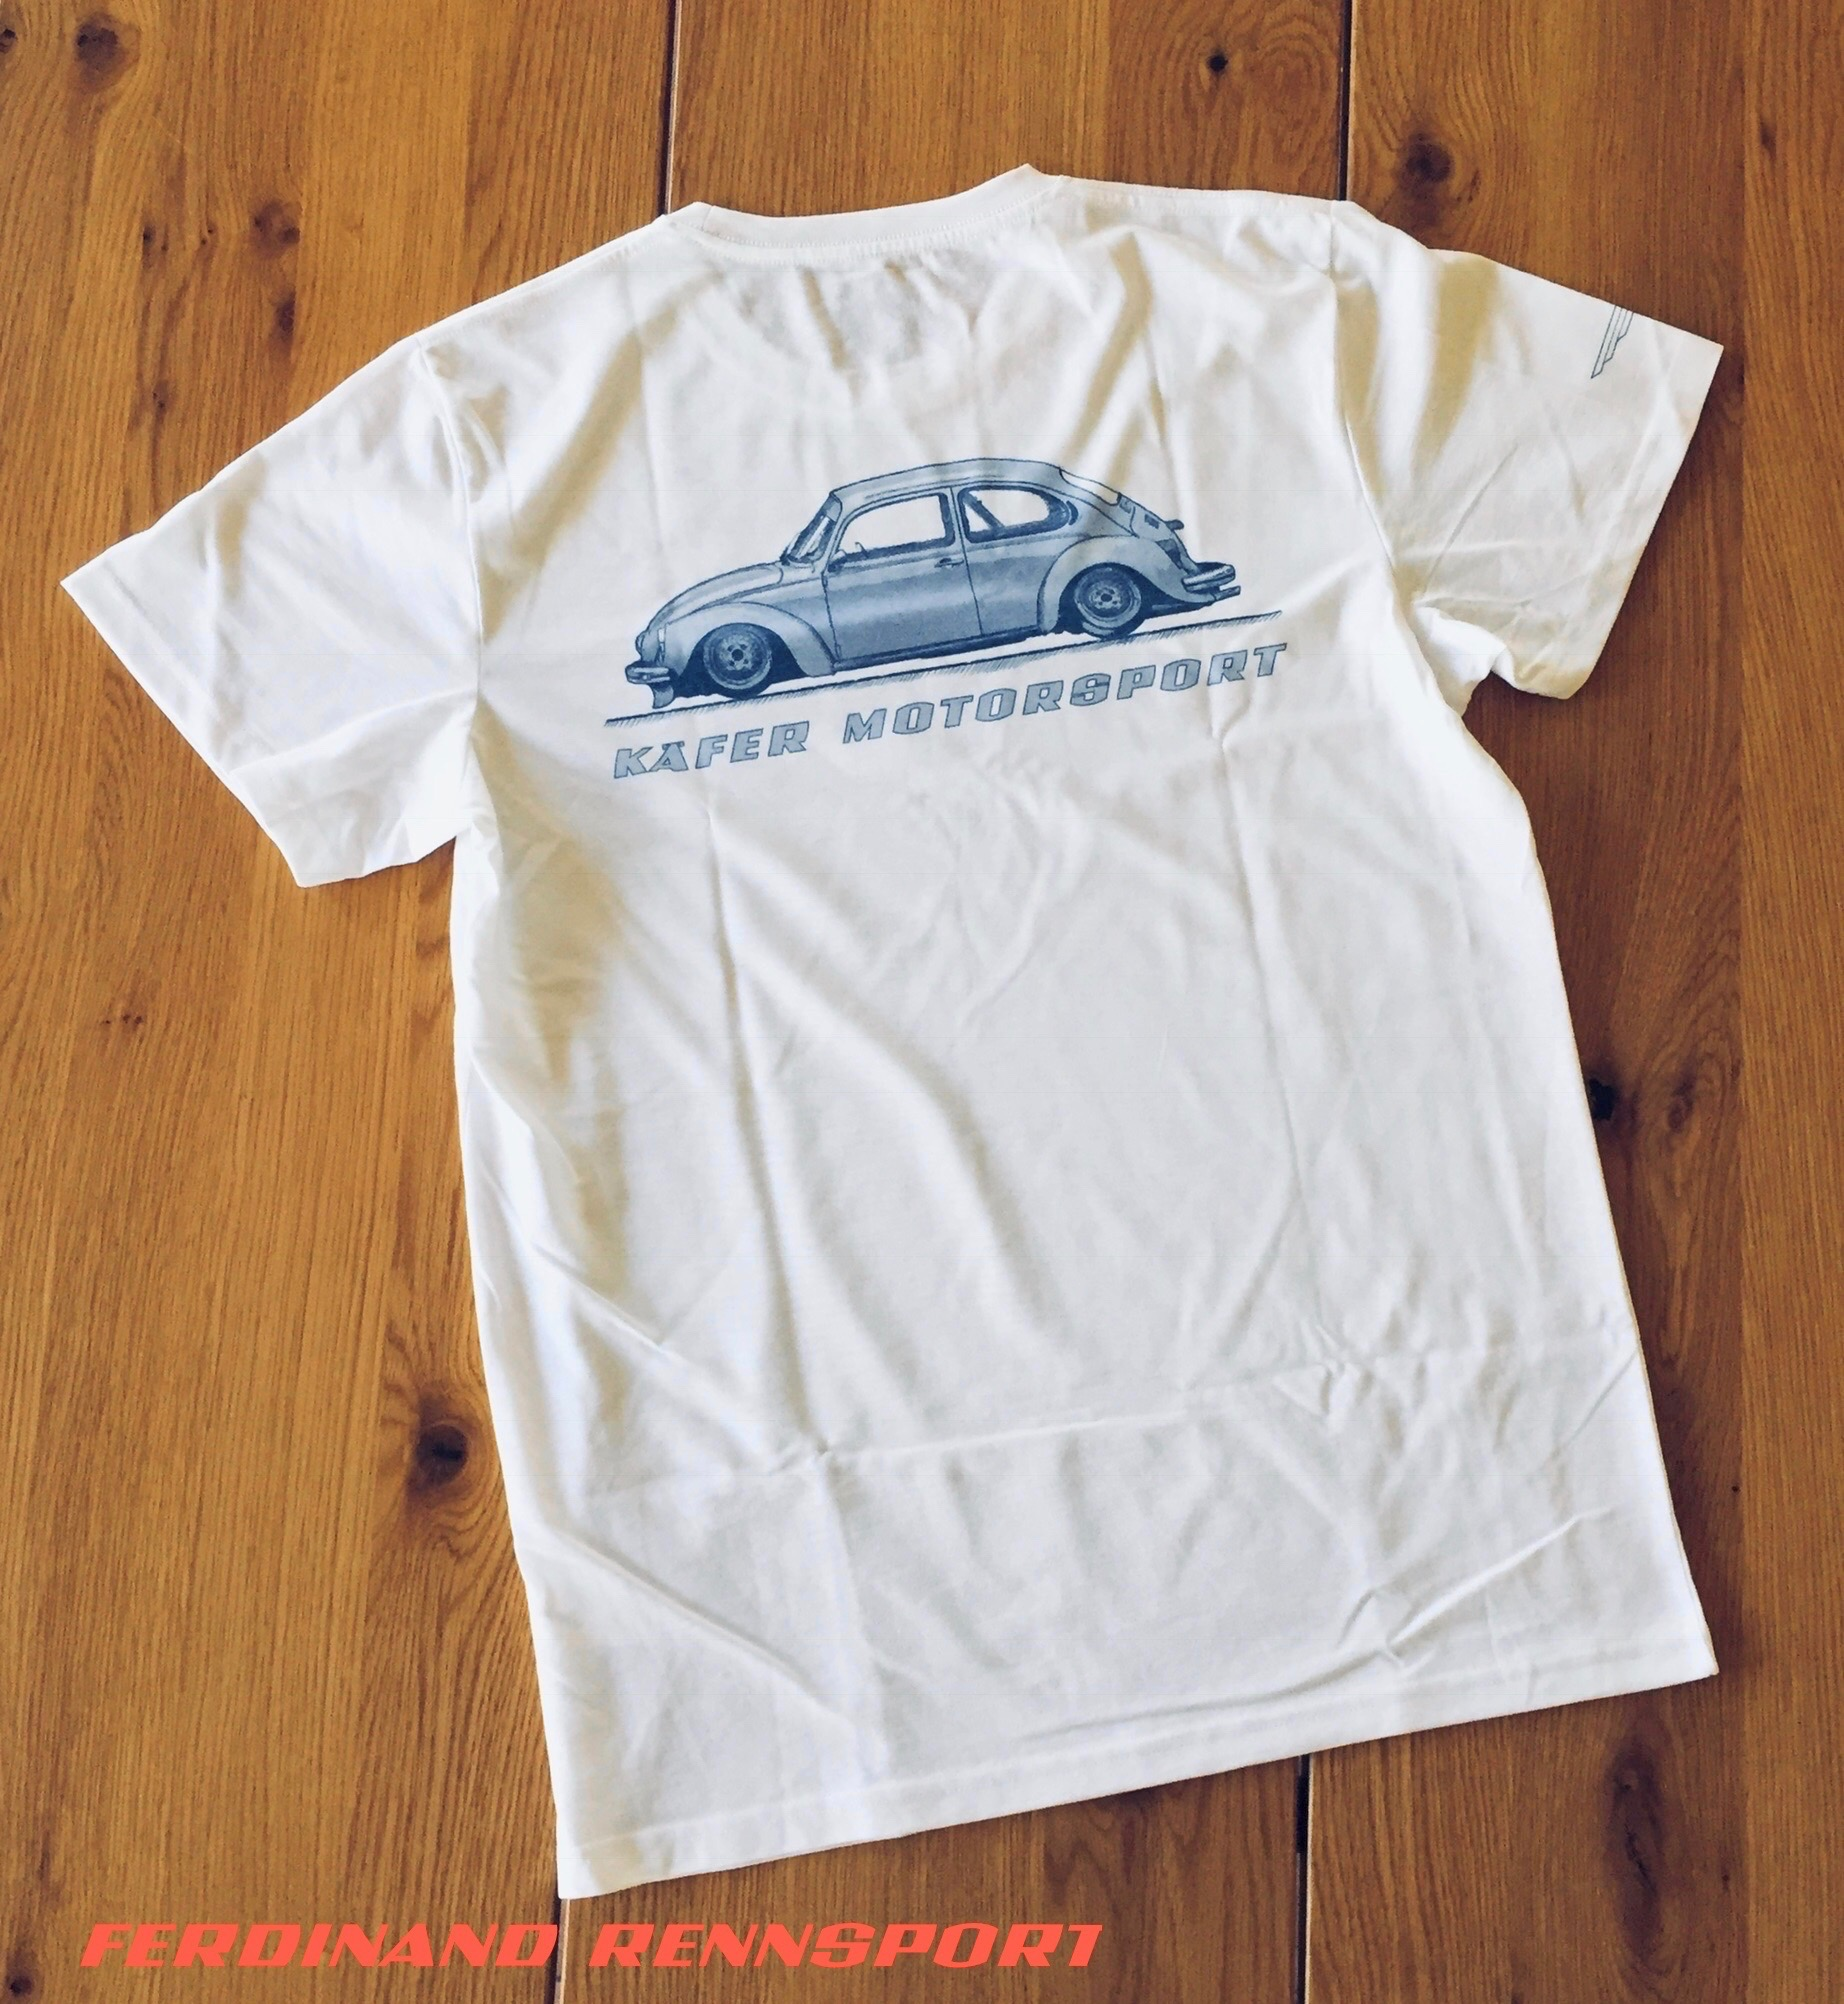 KÄFER MOTORSPORT Shirt